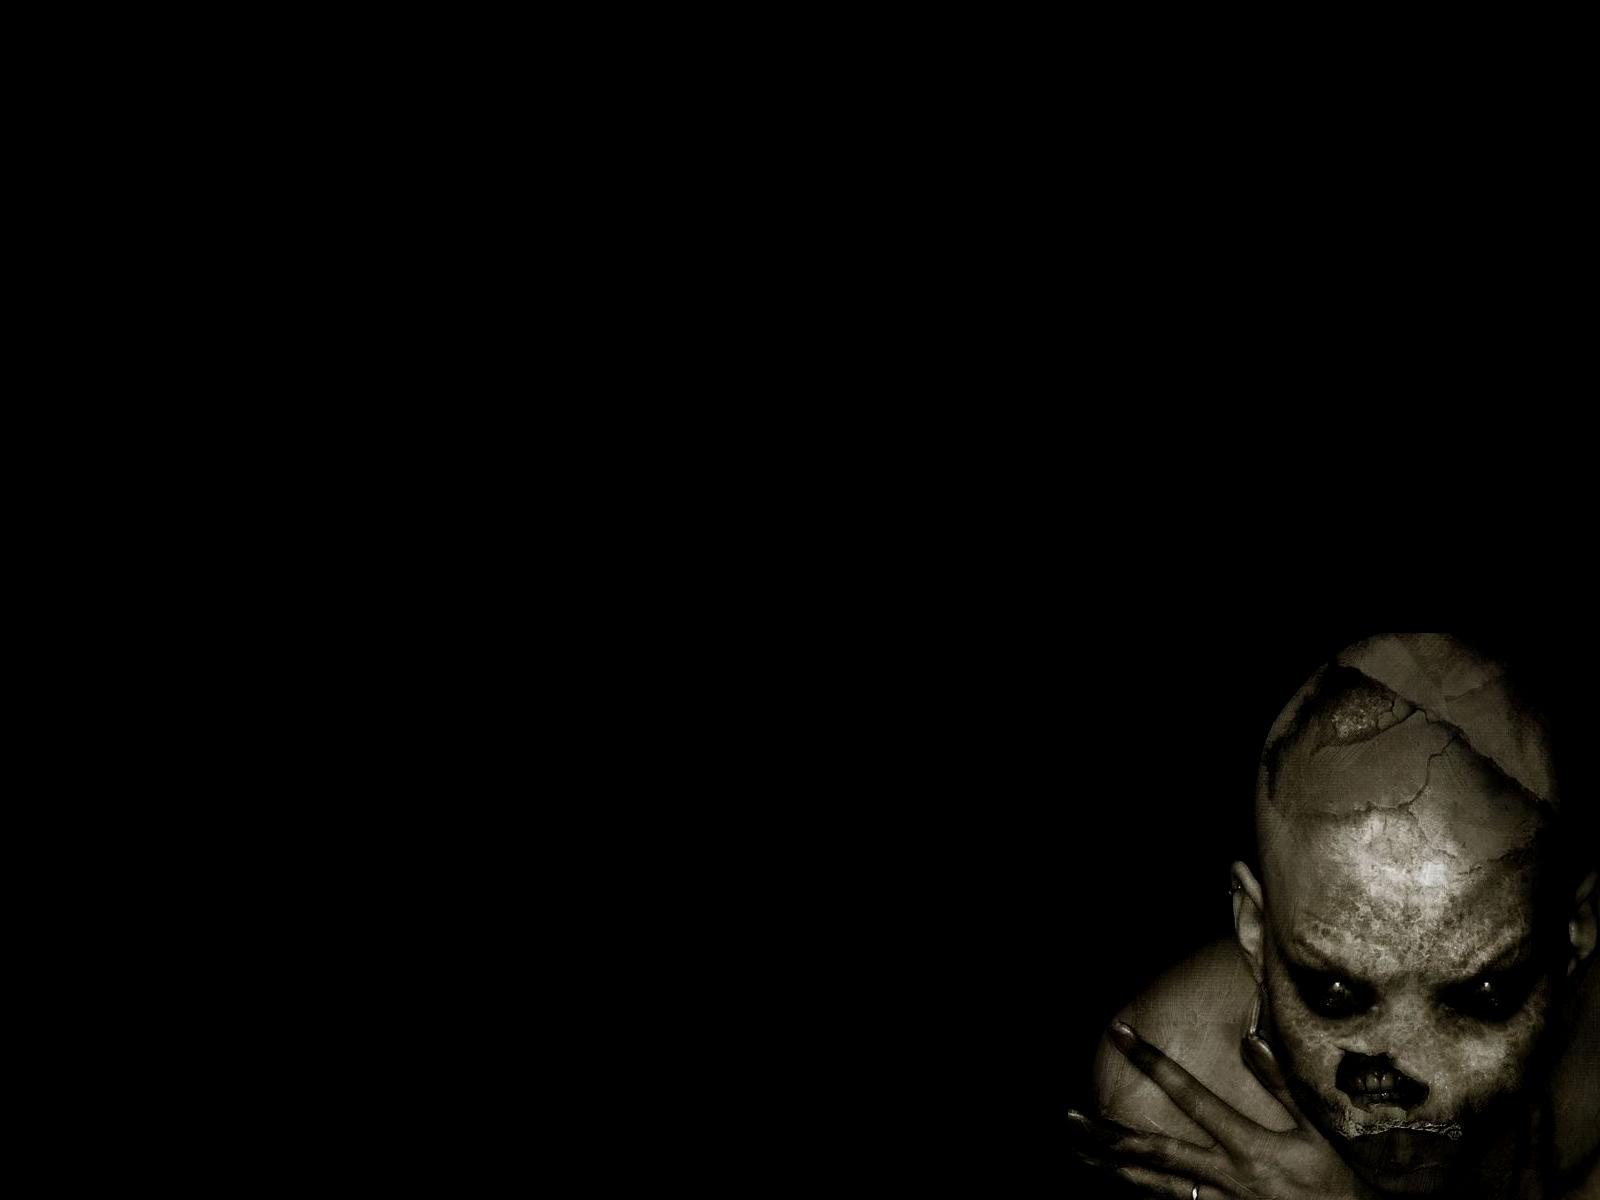 HD Wallpaper | Background ID:1644. 1600x1200 Dark Scary